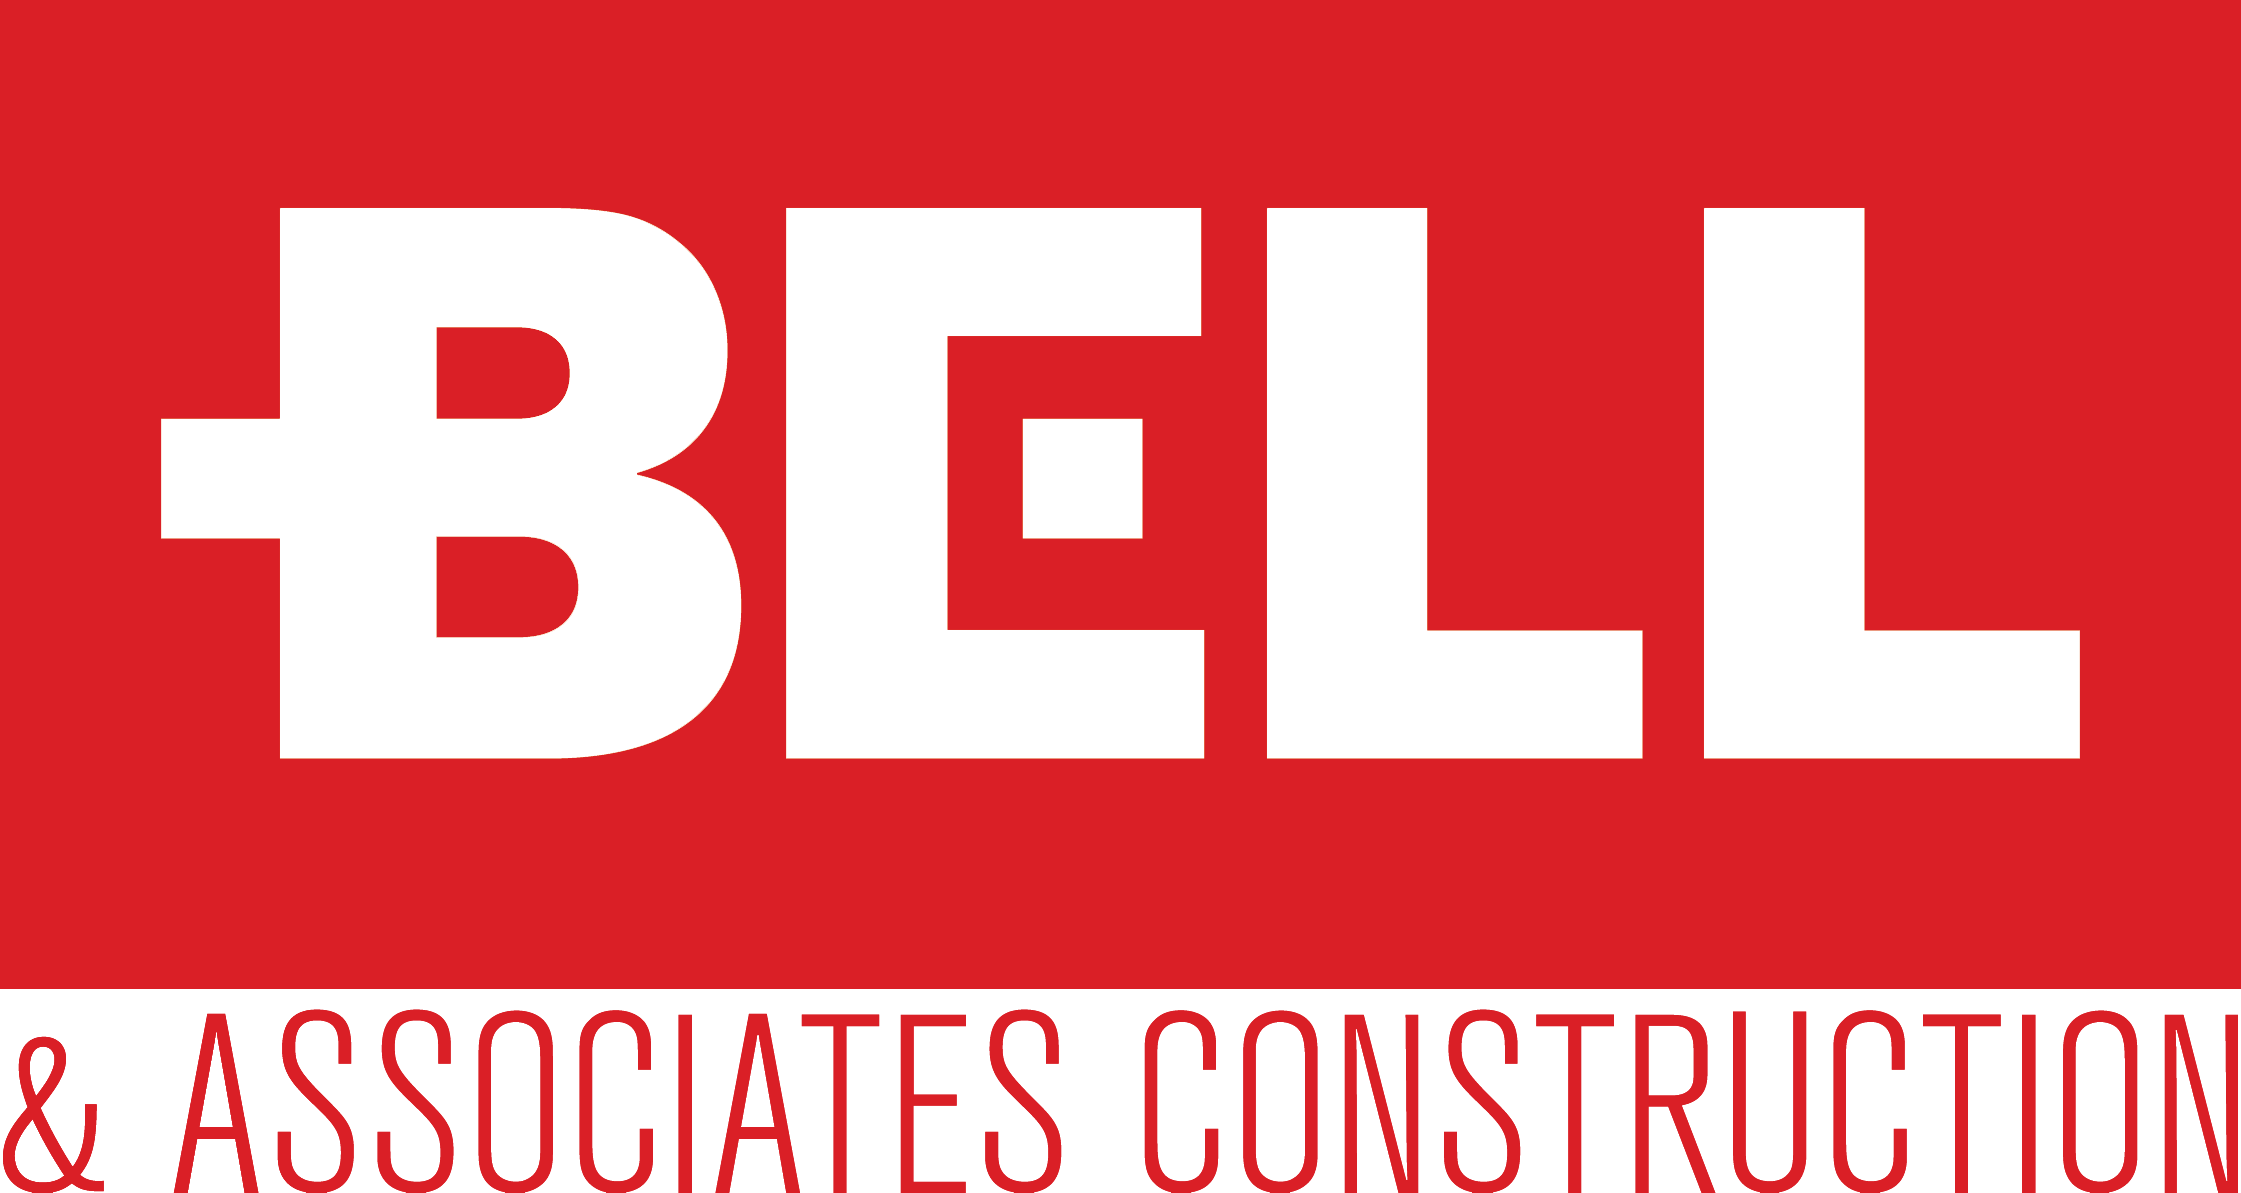 Bell-Logo-White-Bell-Transparent-Background